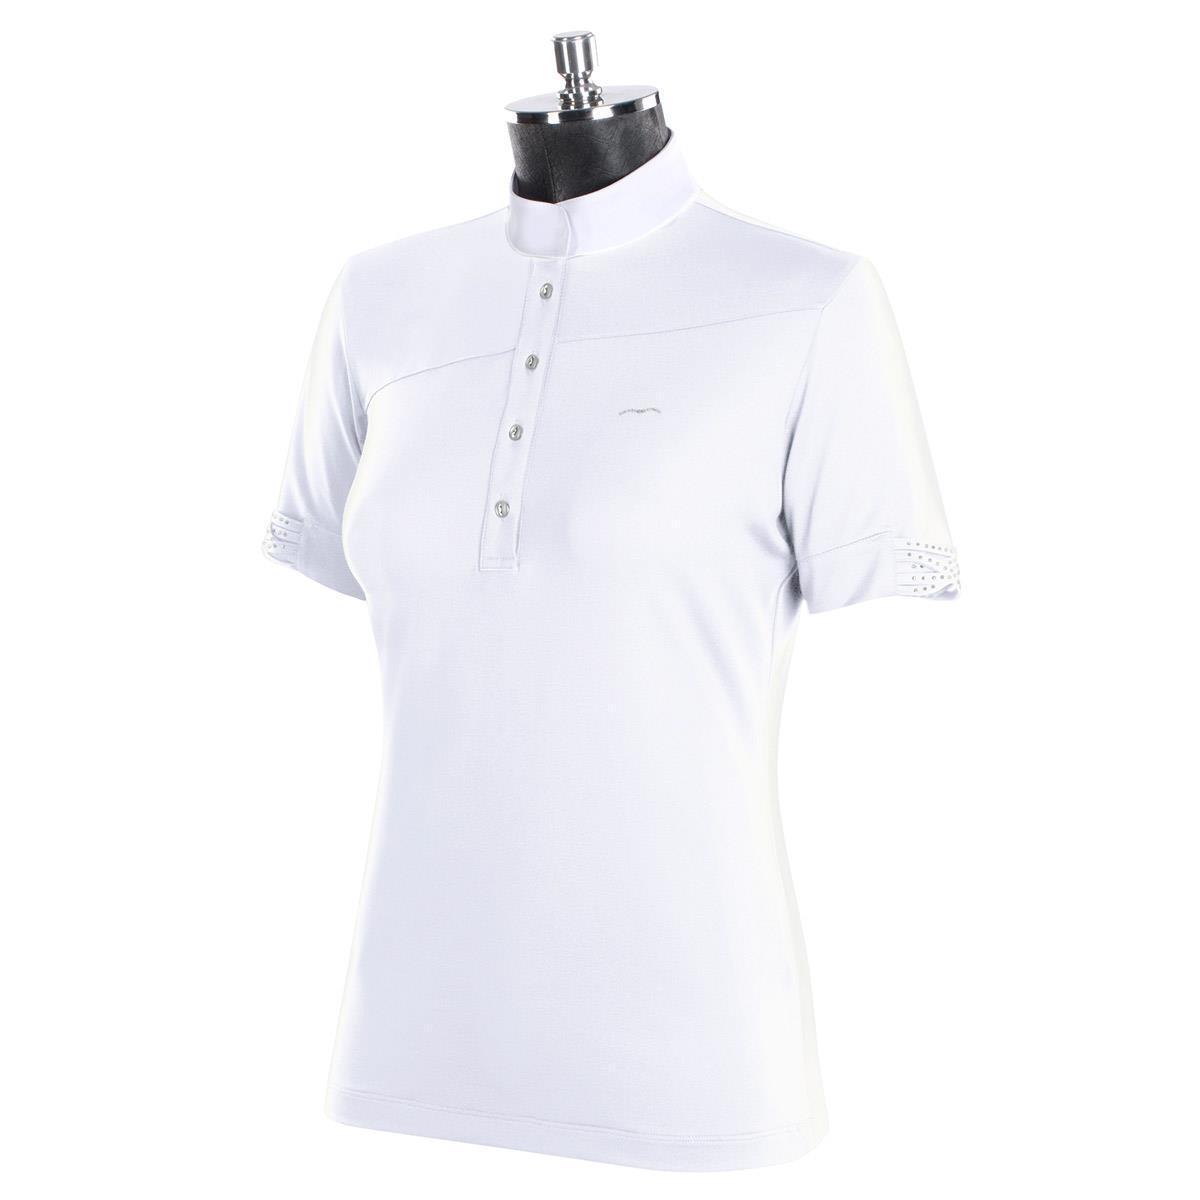 New Animo Bolis Ladies Competition Shirt - Bianco - Was .00